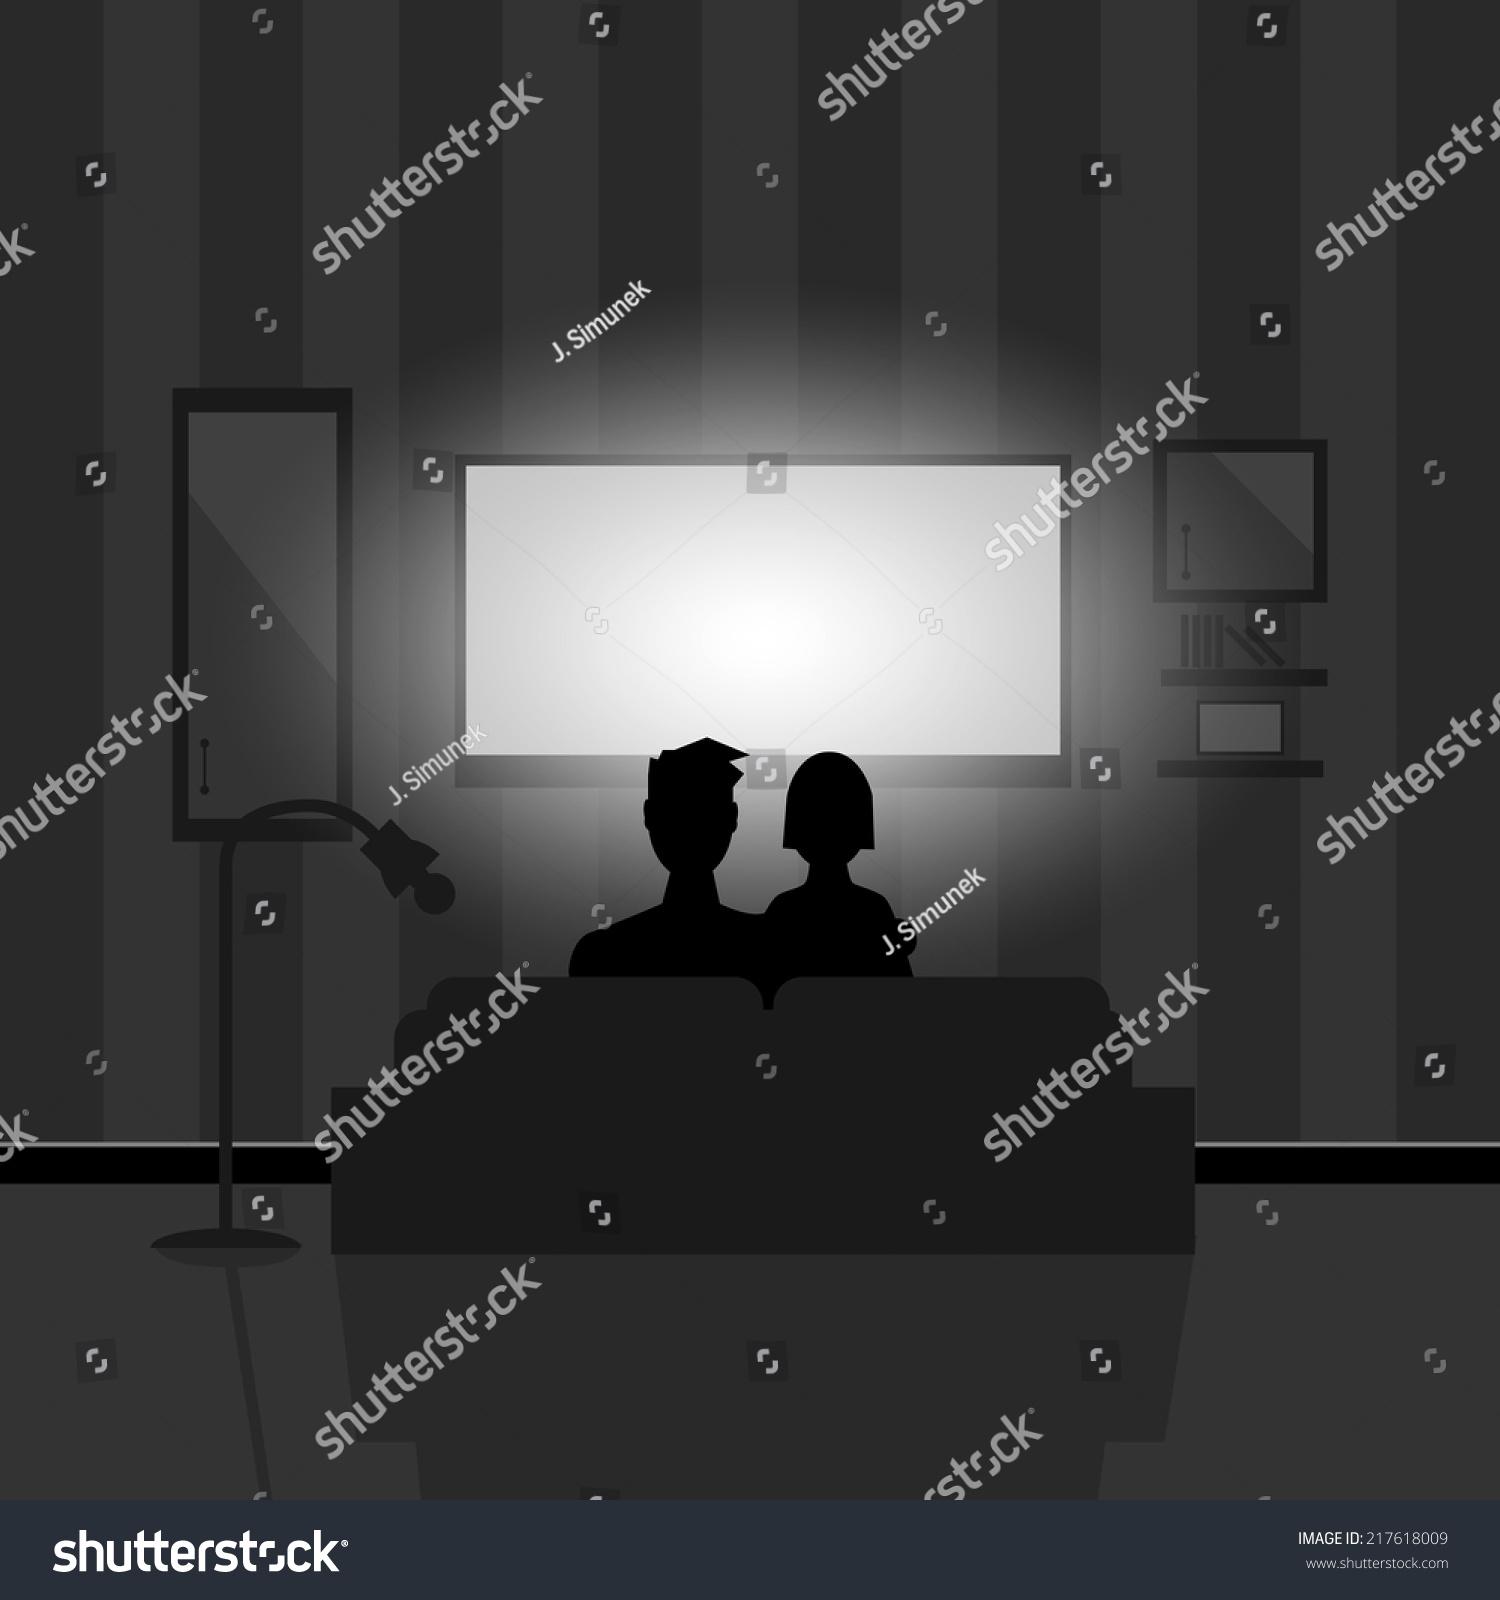 Couple Watching Movie On Tv At Night Stock Vector Illustration 217618009  Shutterstock